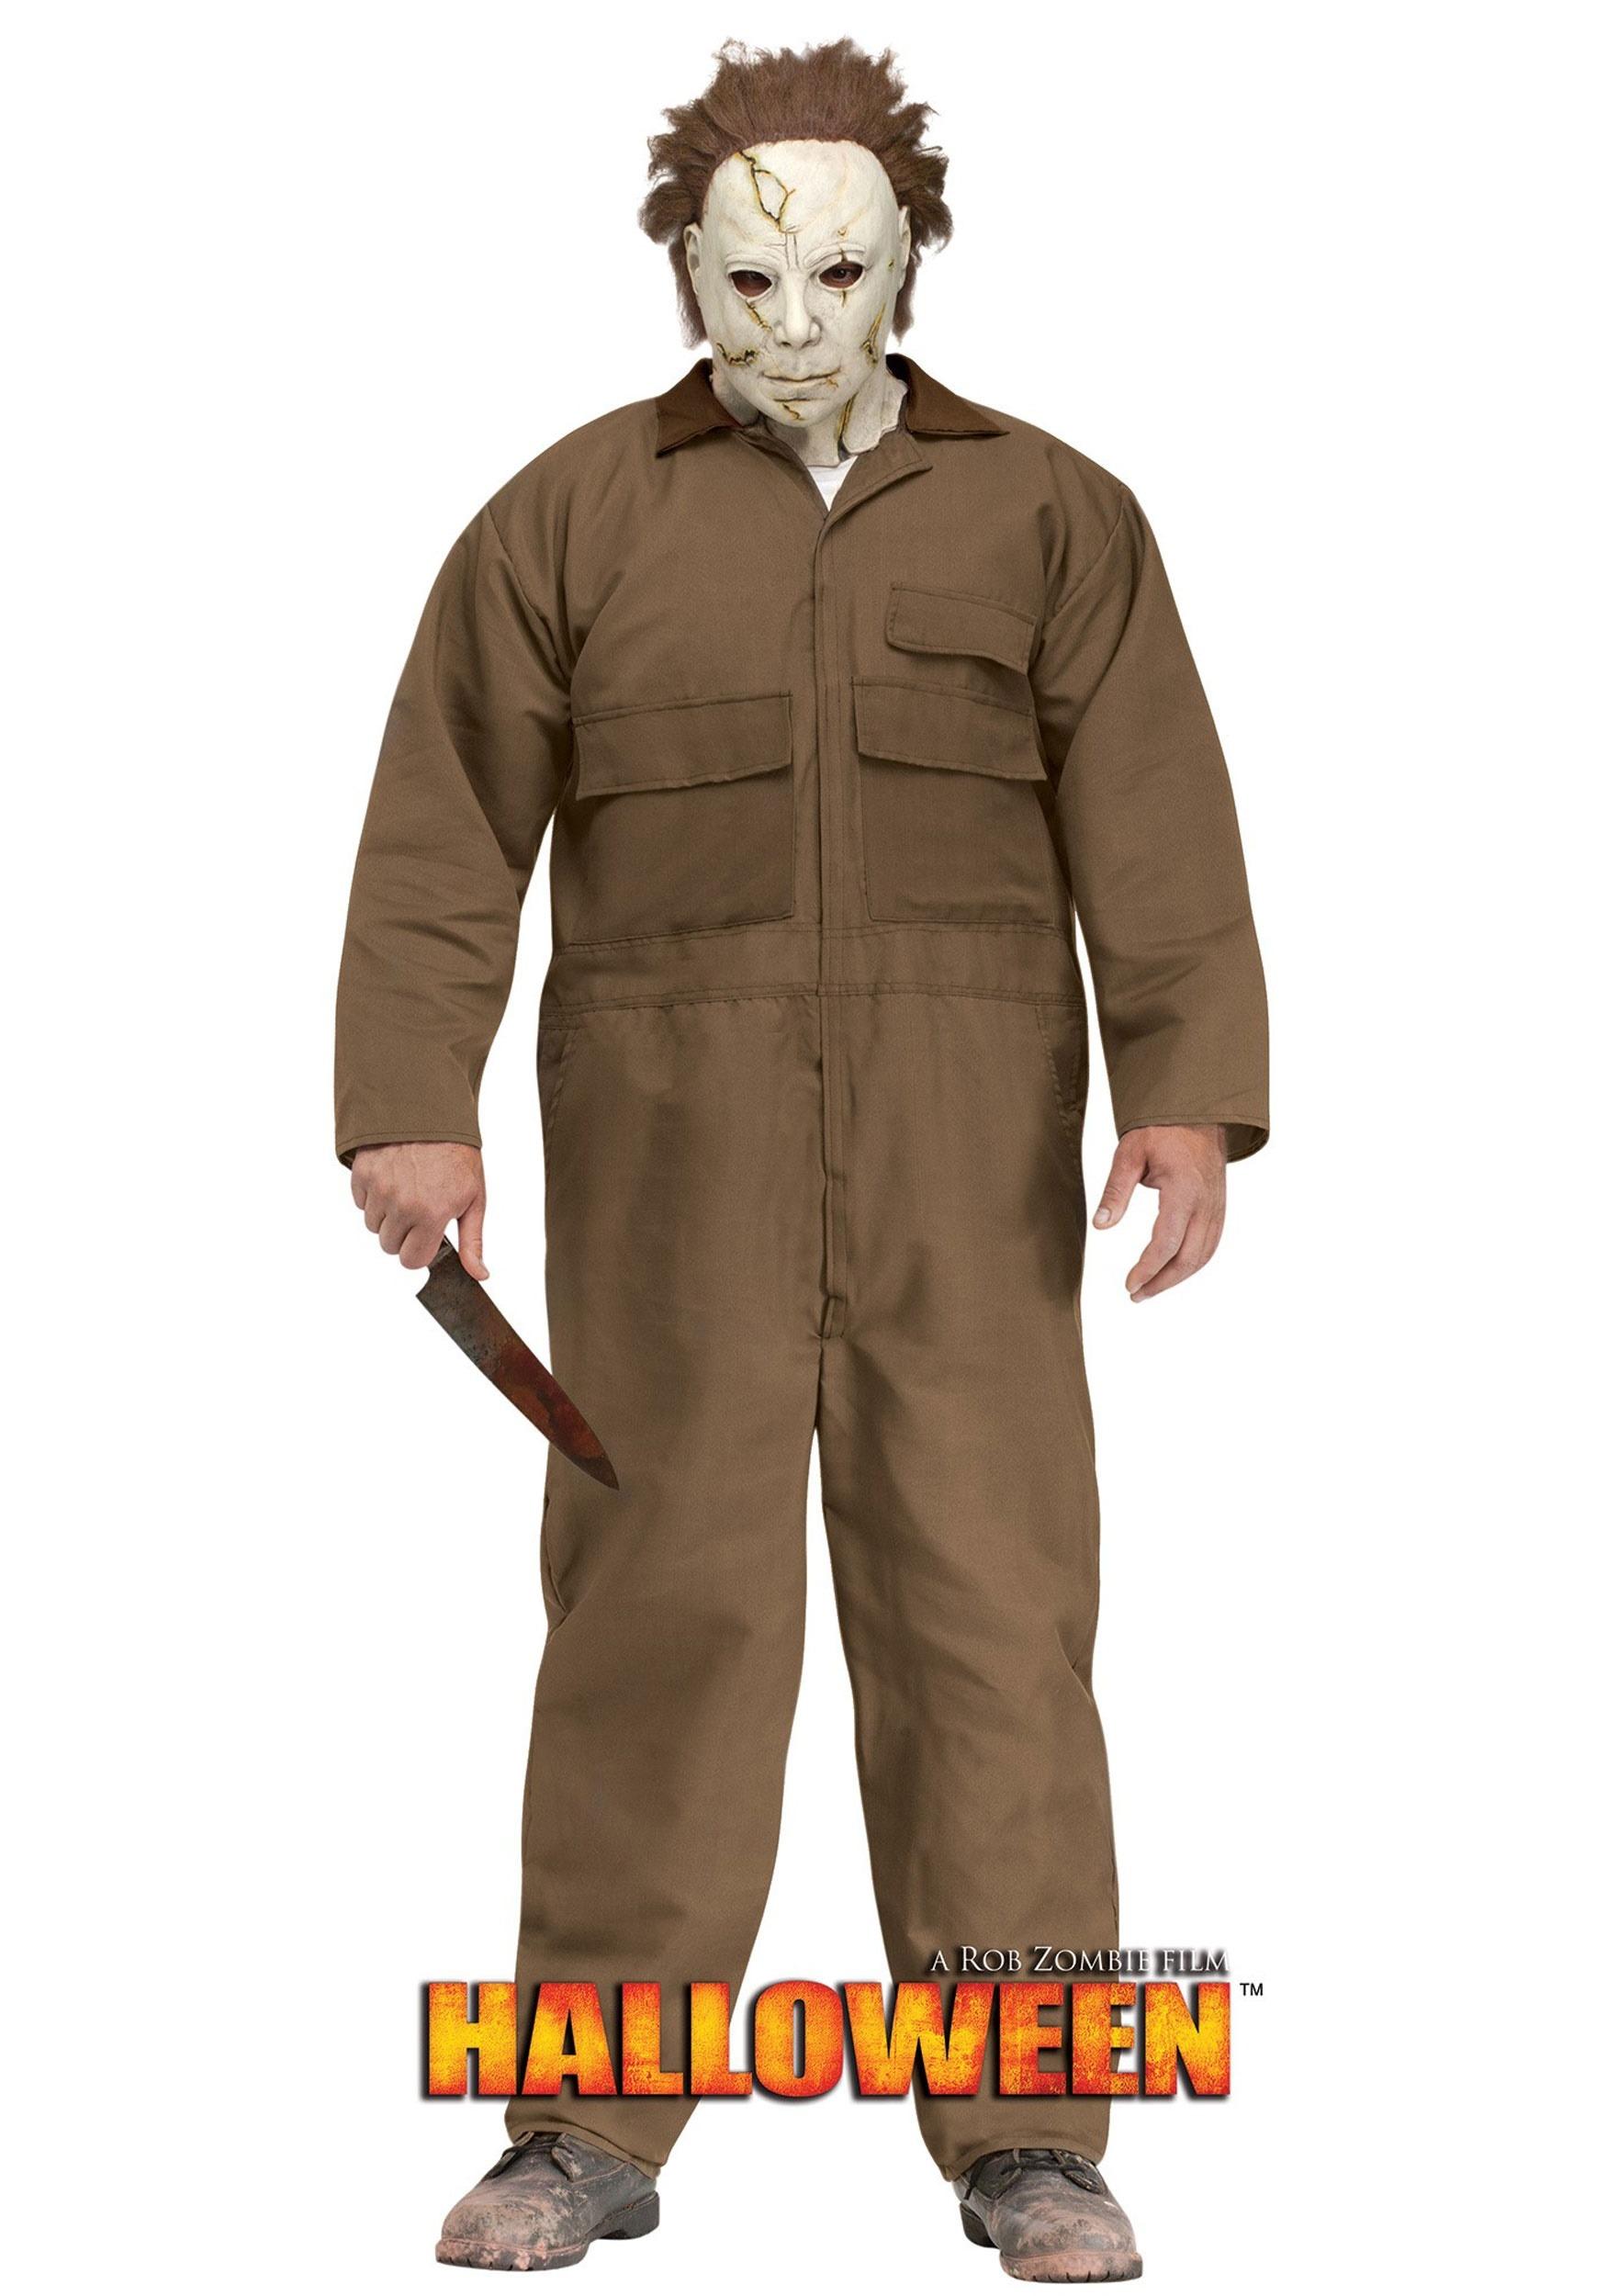 Halloween Michael Myers Costume.Rob Zombie Halloween Michael Myers Men S Plus Size Costume